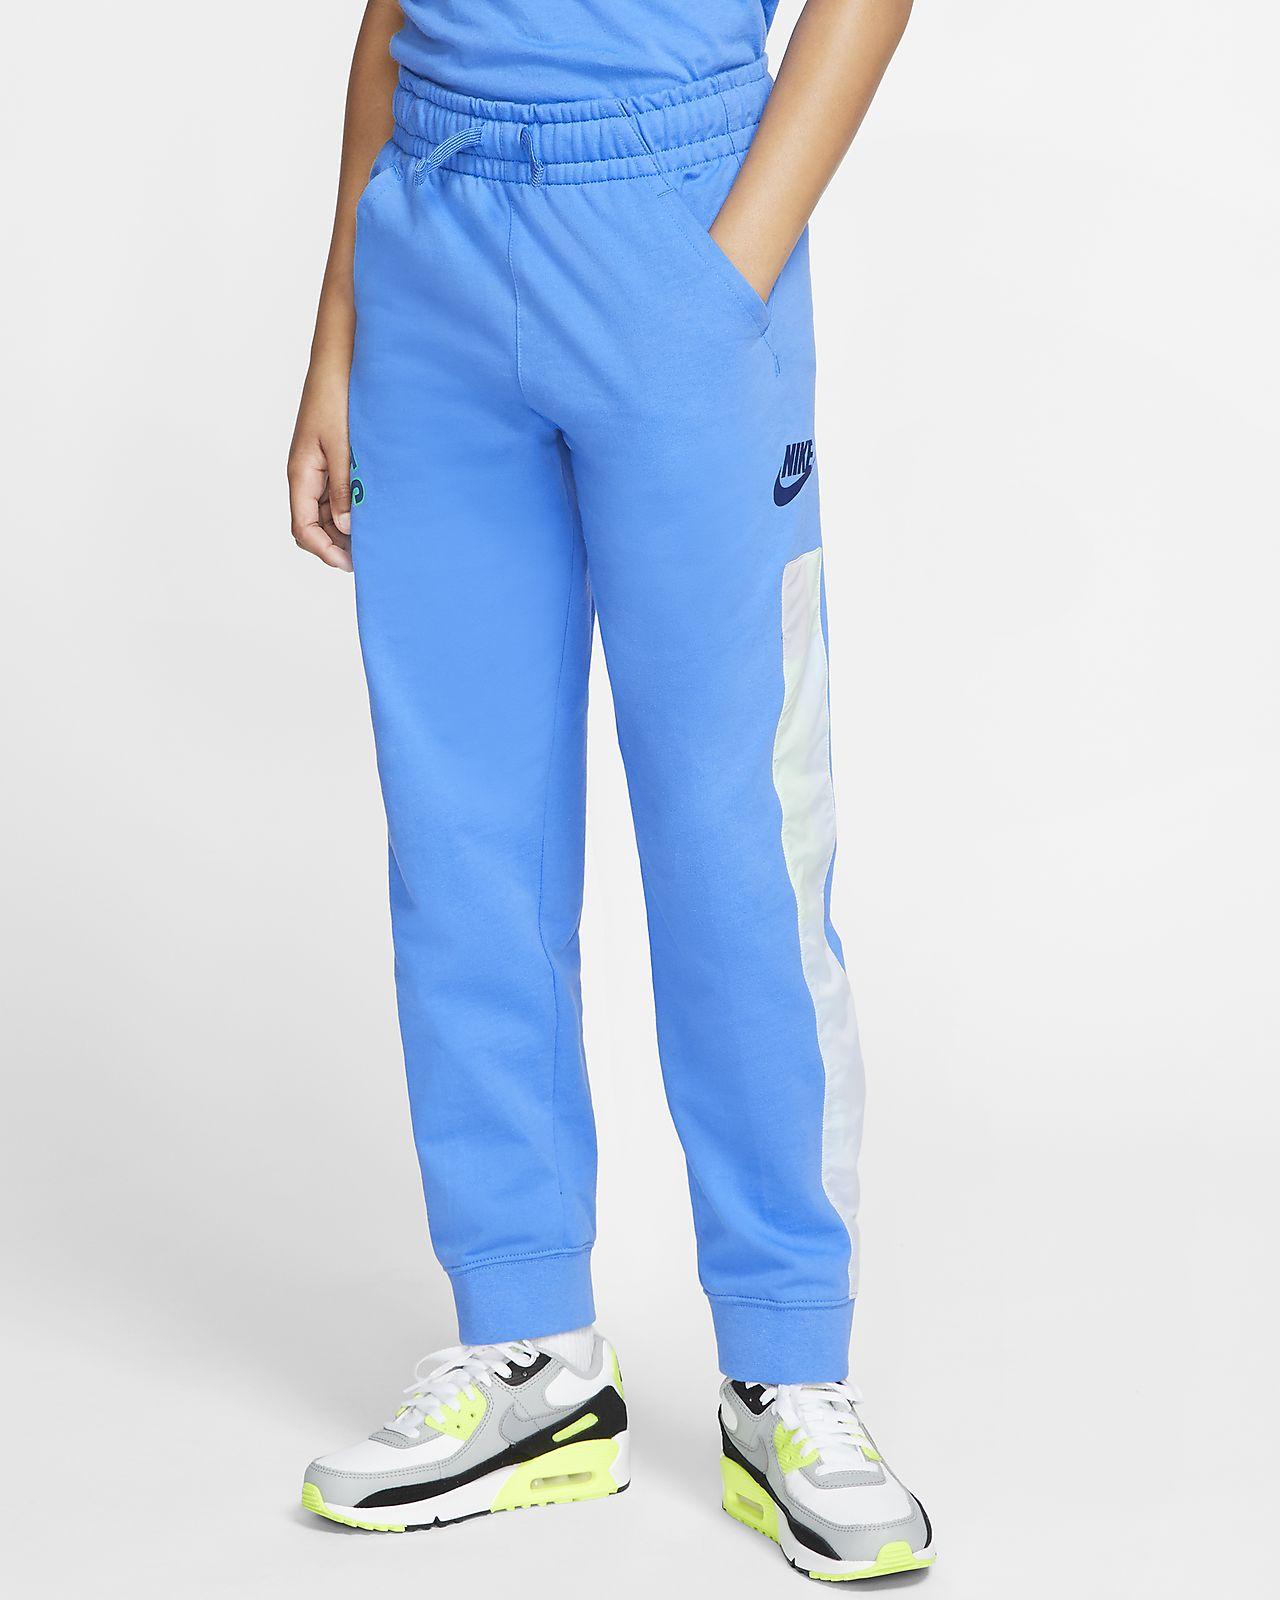 Nike Sportswear 大童 (男童) 運動褲